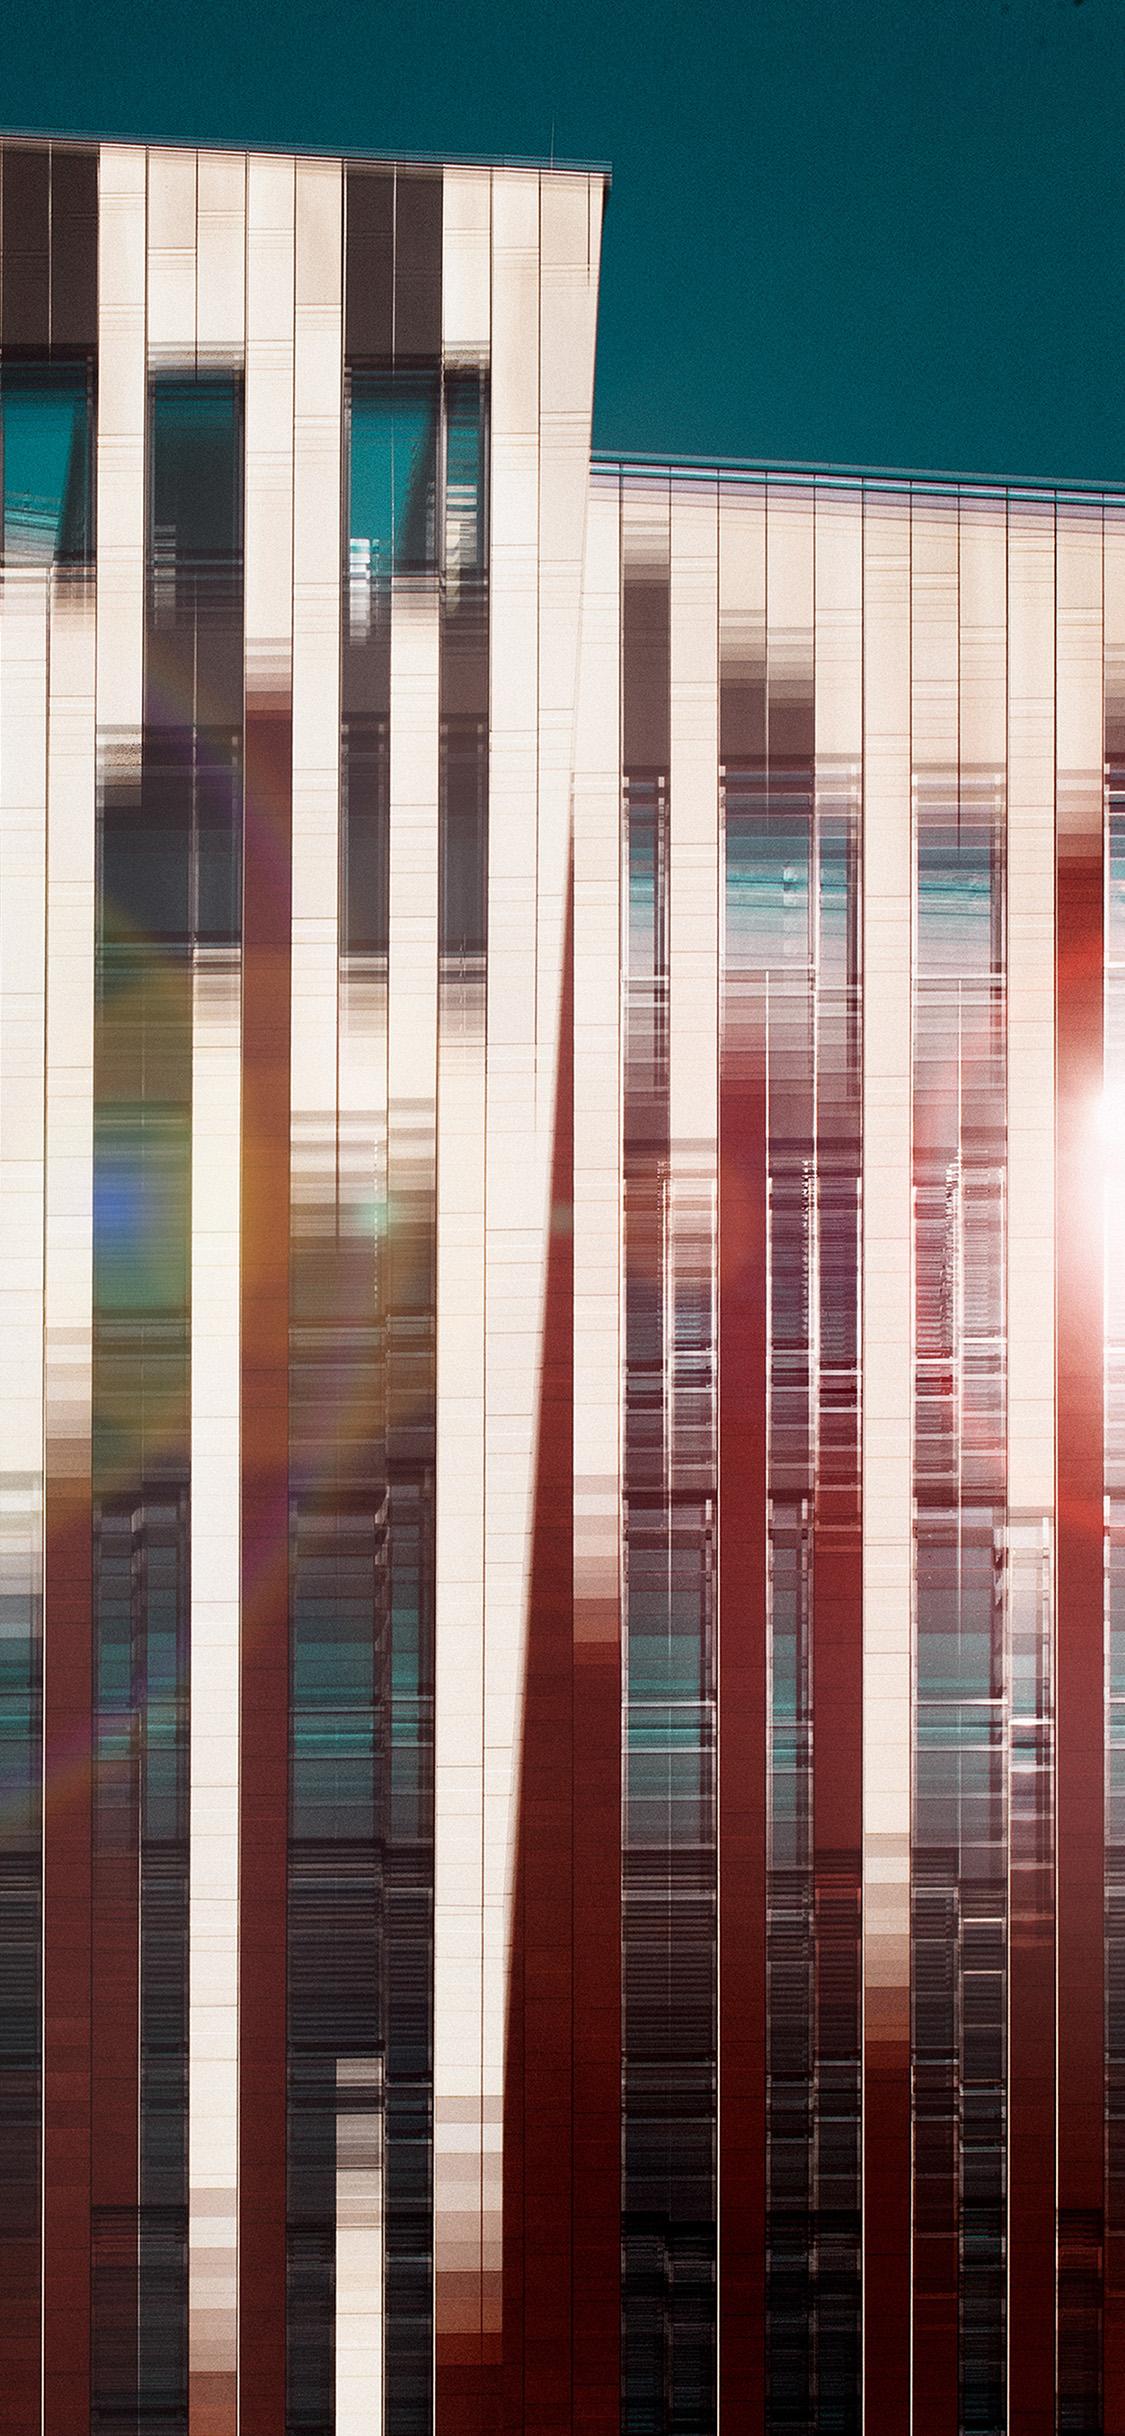 iPhonexpapers.com-Apple-iPhone-wallpaper-bk52-art-abstract-building